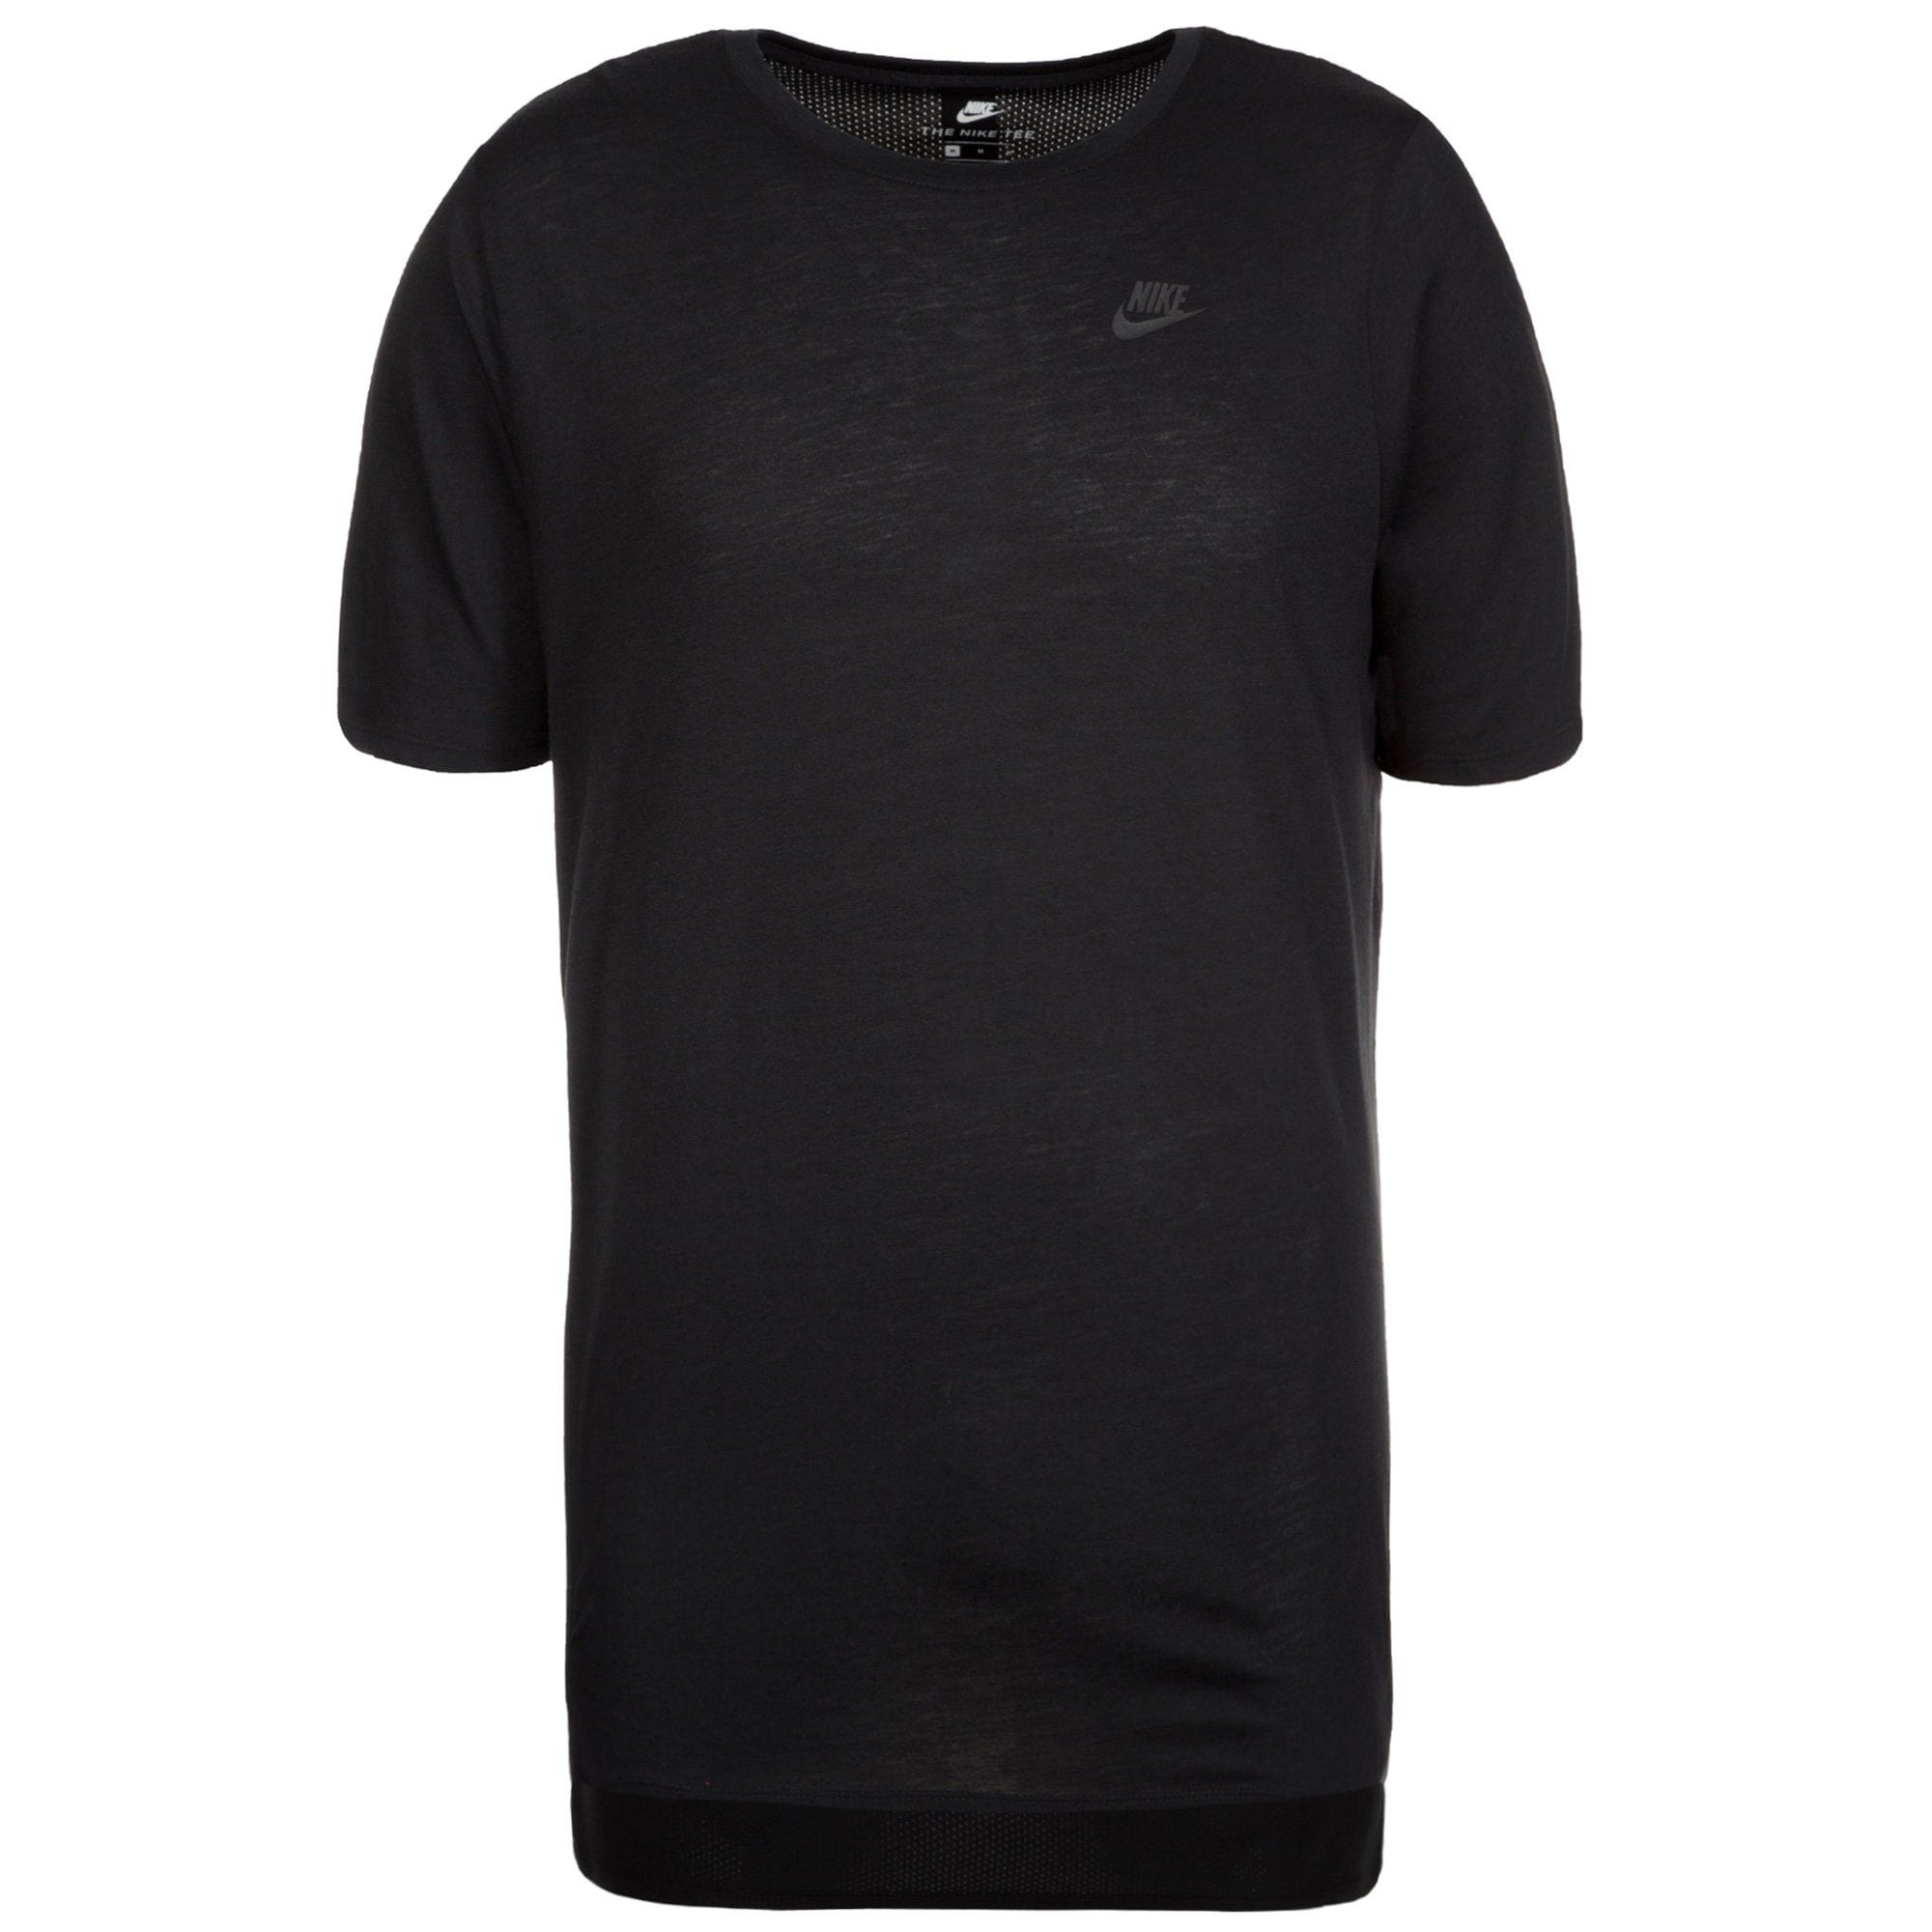 Nike Sportswear Triblend Droptail T-Shirt Herren | Sportbekleidung > Sportshirts > T-Shirts | Schwarz | Polyester - Baumwolle | Nike Sportswear